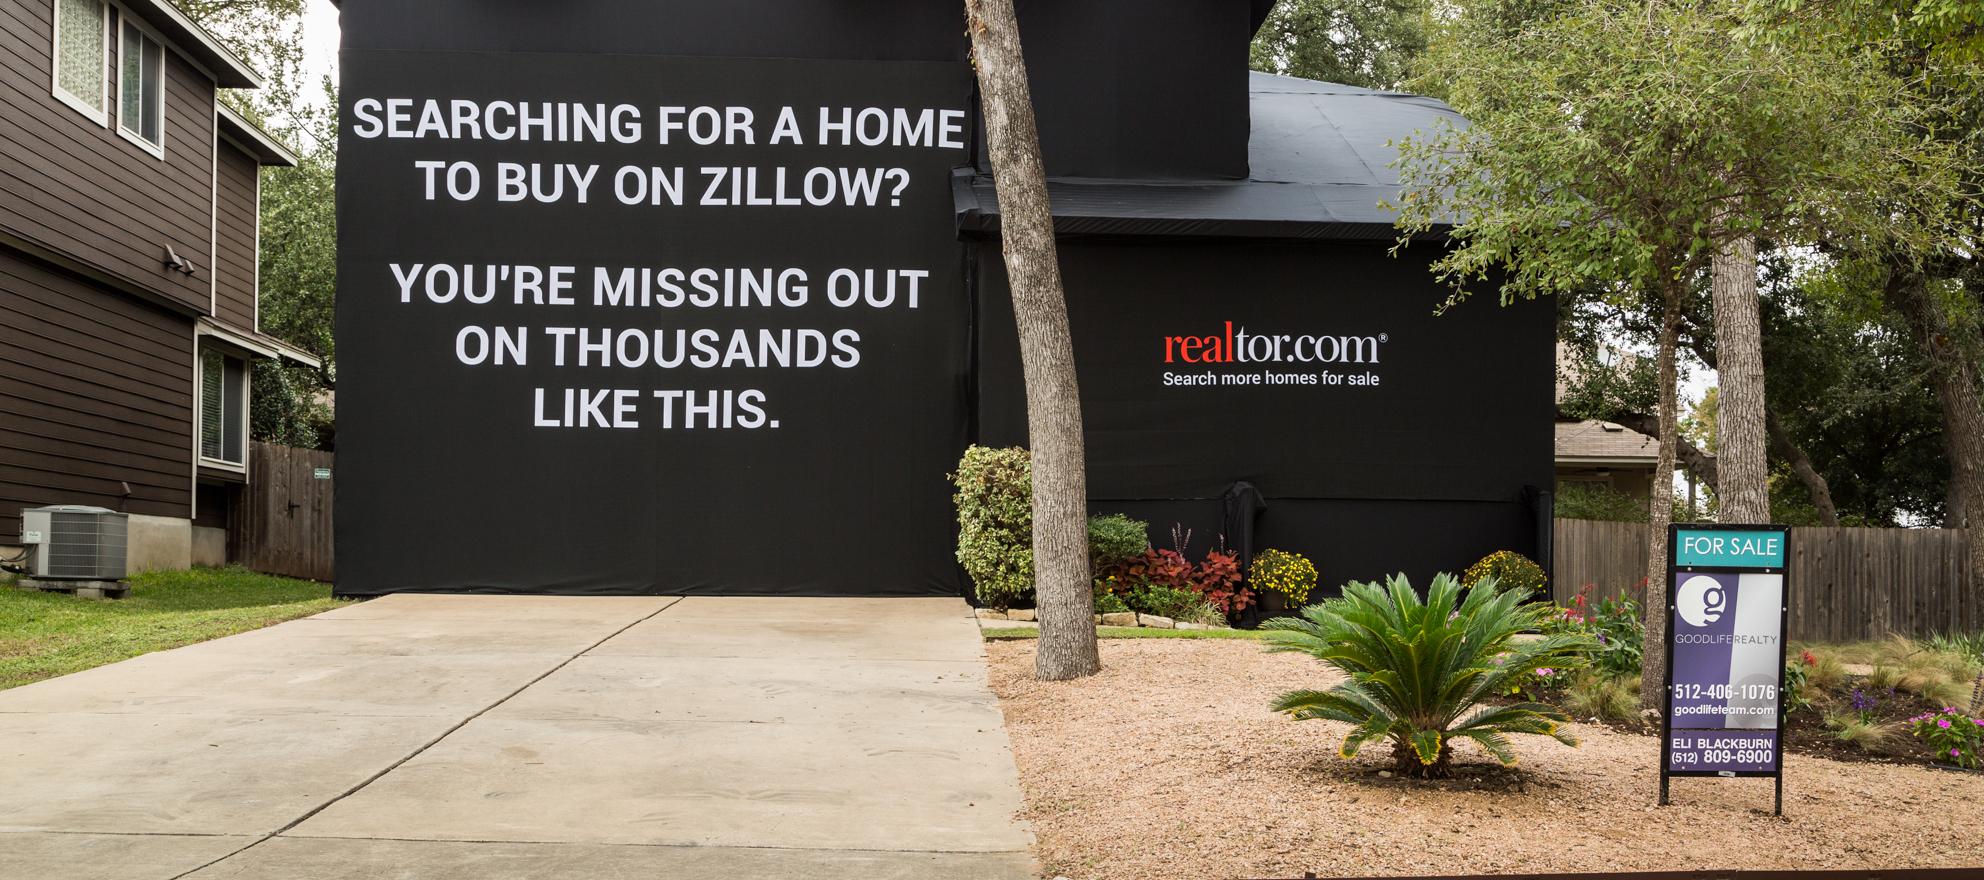 Realtor.com vs. Zillow: 'Experiential Ad' Wraps Austin Home